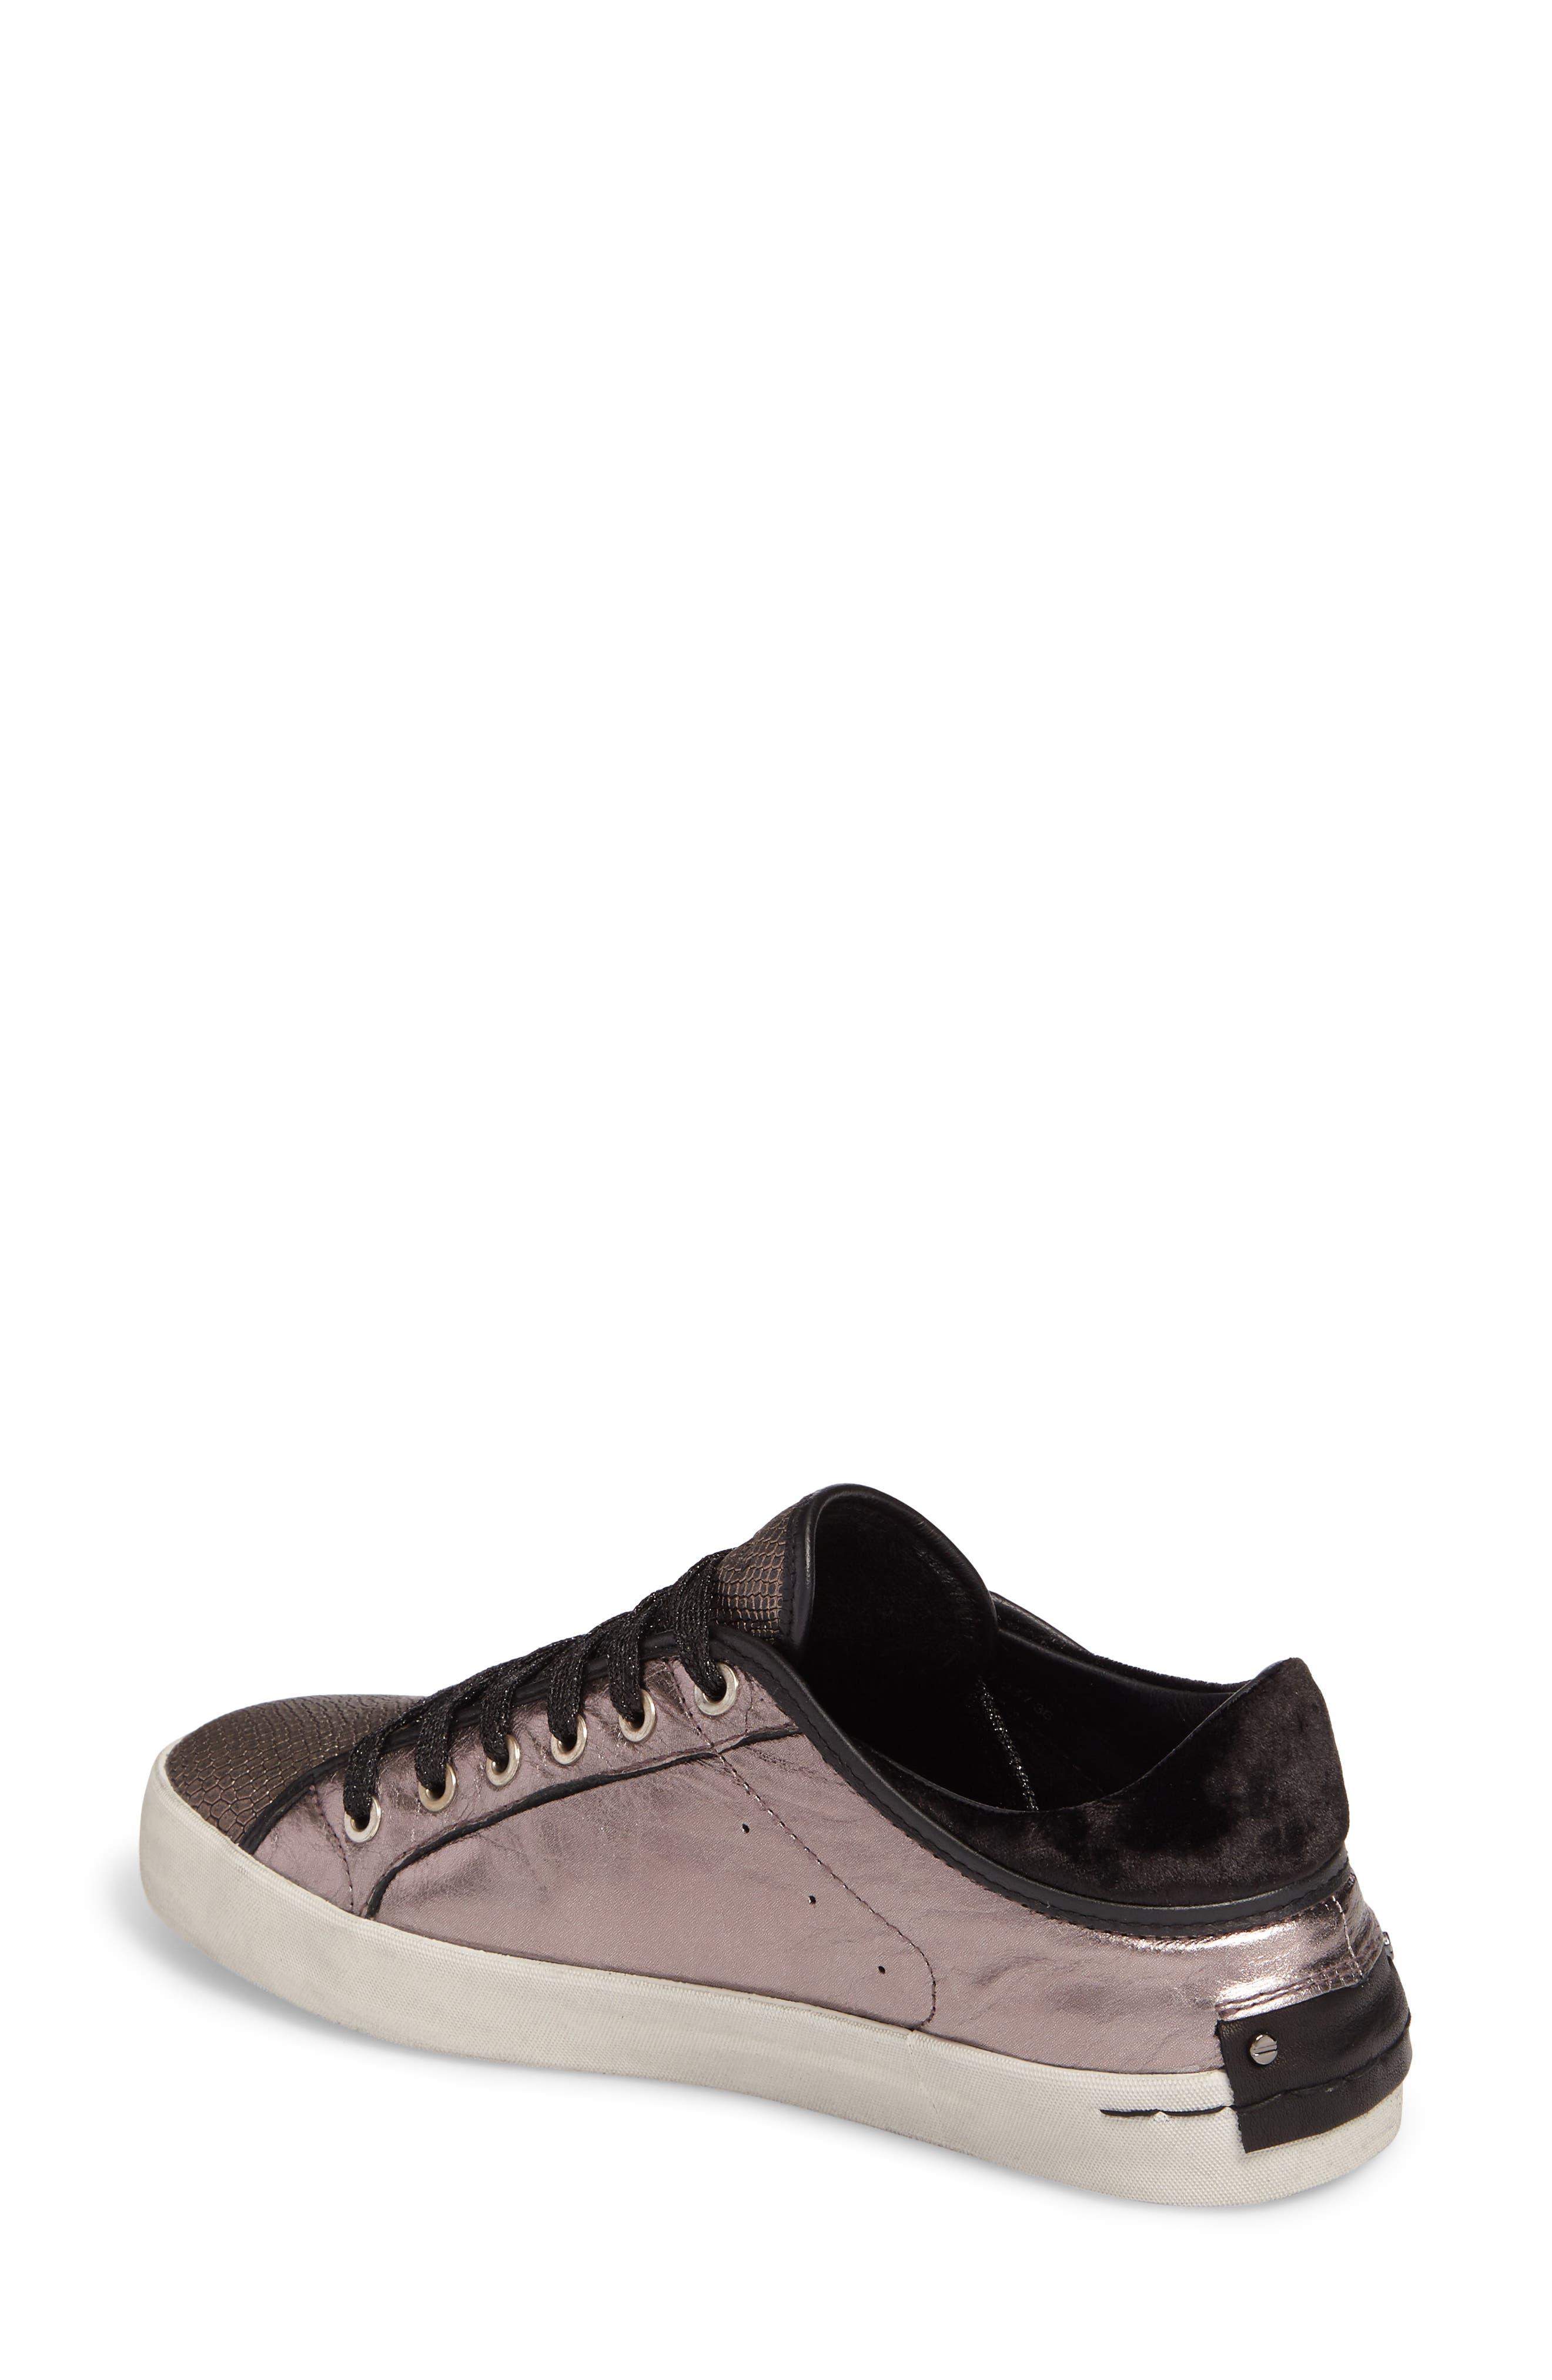 Faith Sneaker,                             Alternate thumbnail 2, color,                             Silver - 23